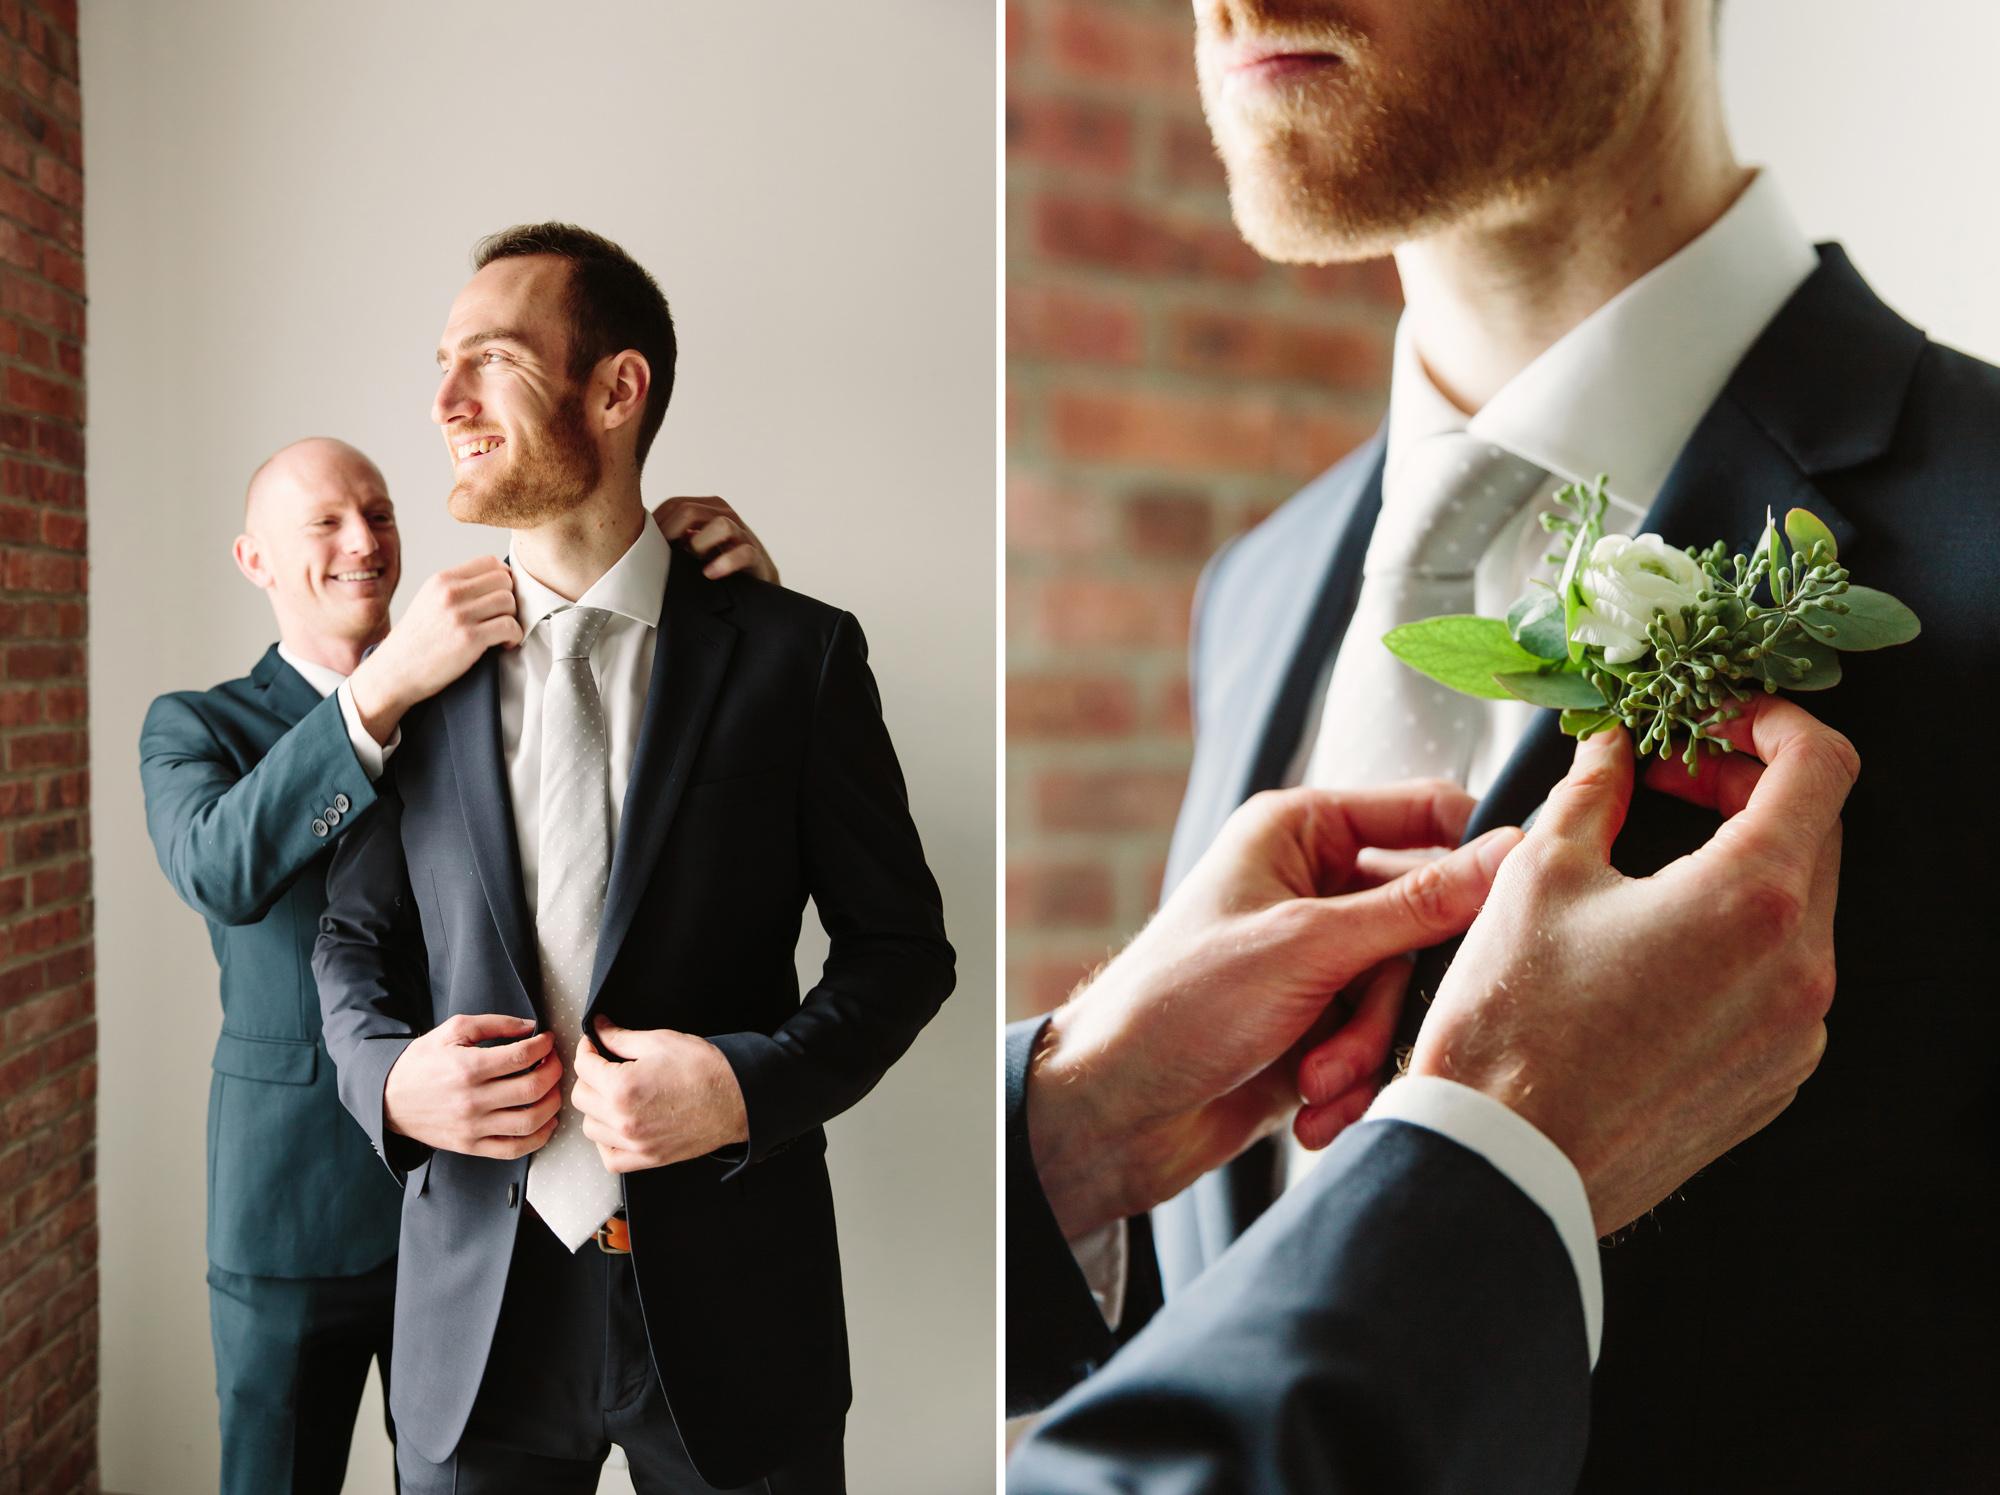 11_Kate_Sam_Picnic_House_Wedding_Brooklyn_NY_Tanya_Salazar_Photography.jpg